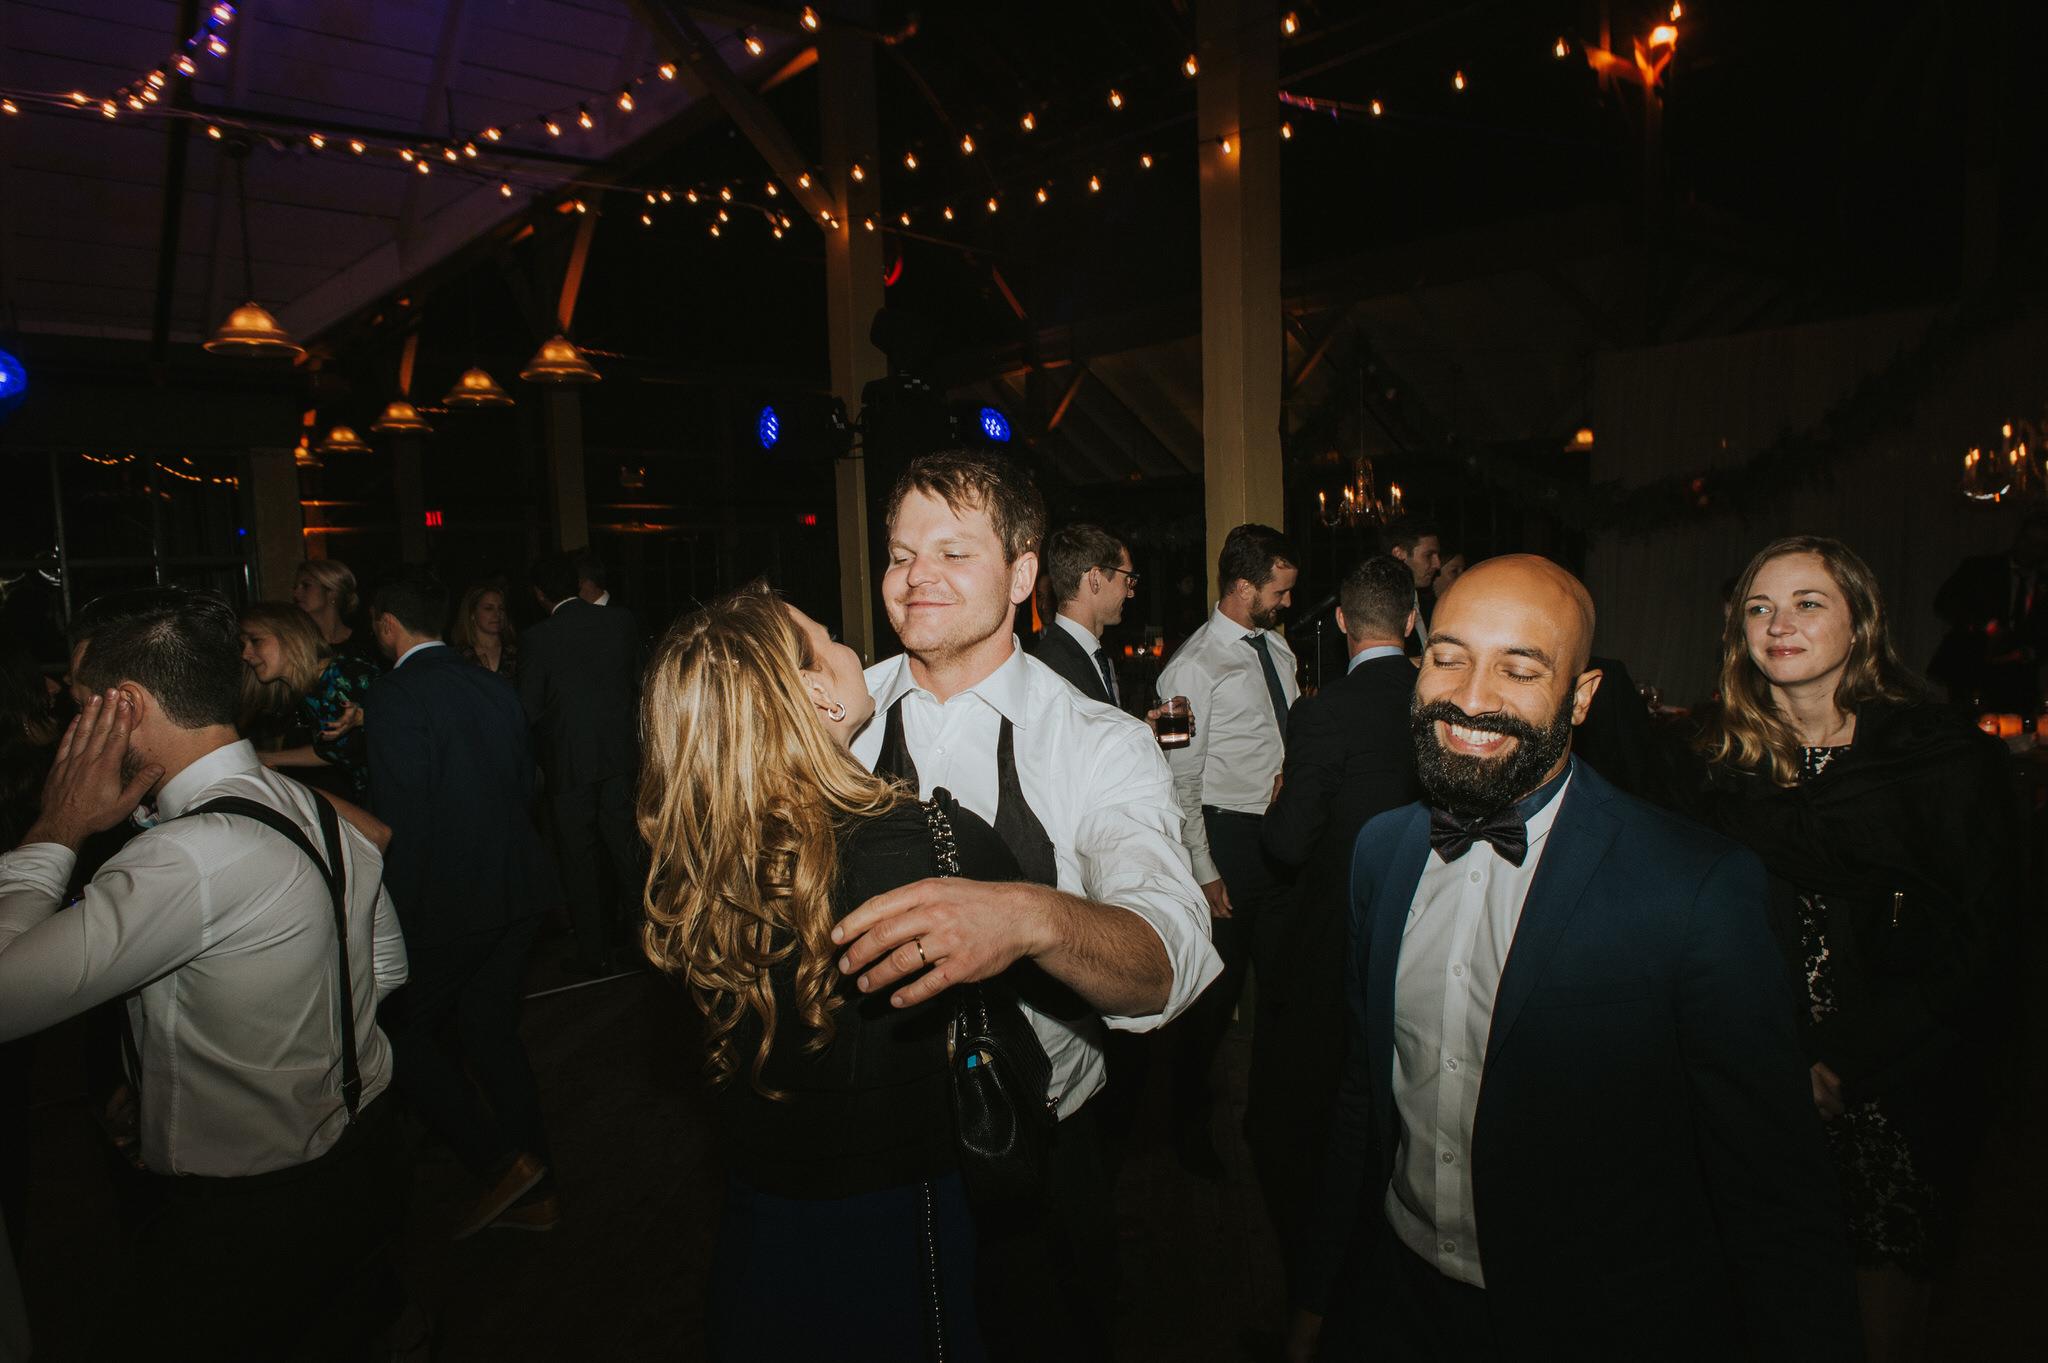 scarletoneillphotography_weddingphotography_prince edward county weddings214.JPG